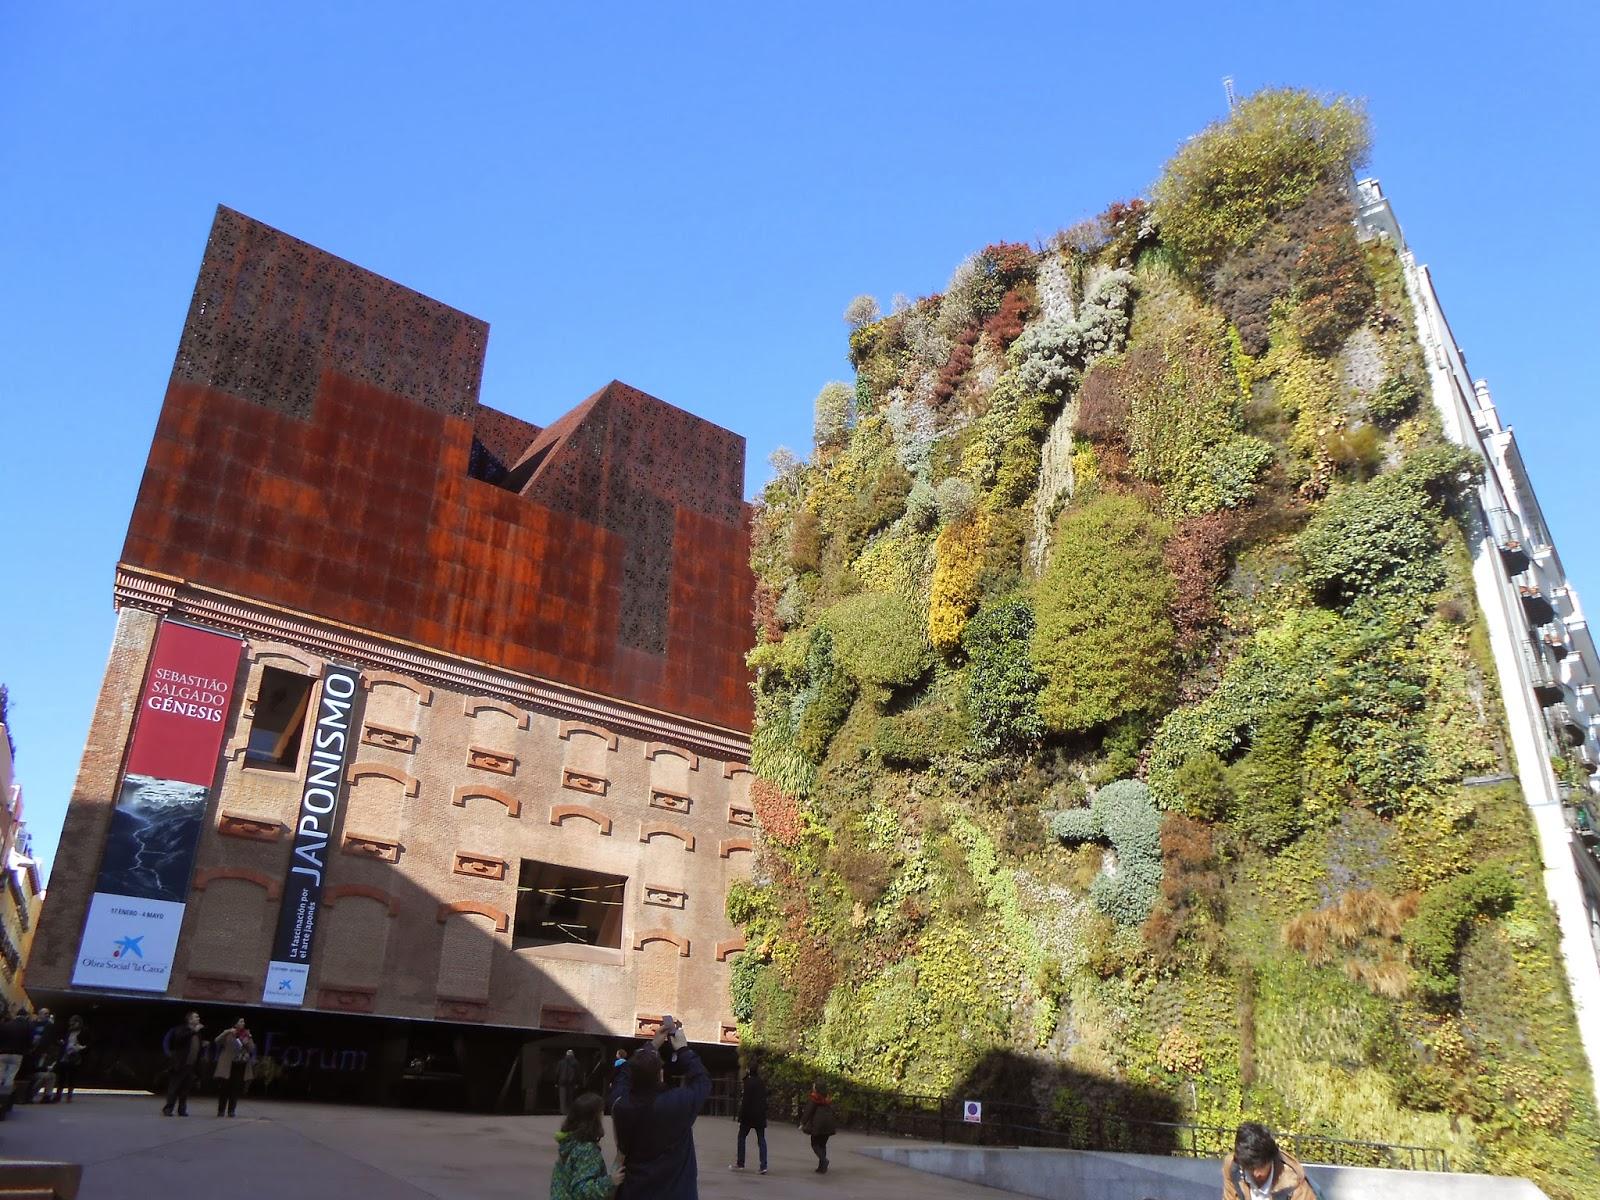 Madrid giardino verticale del caixa forum patrick blanc - Giardino verticale madrid ...